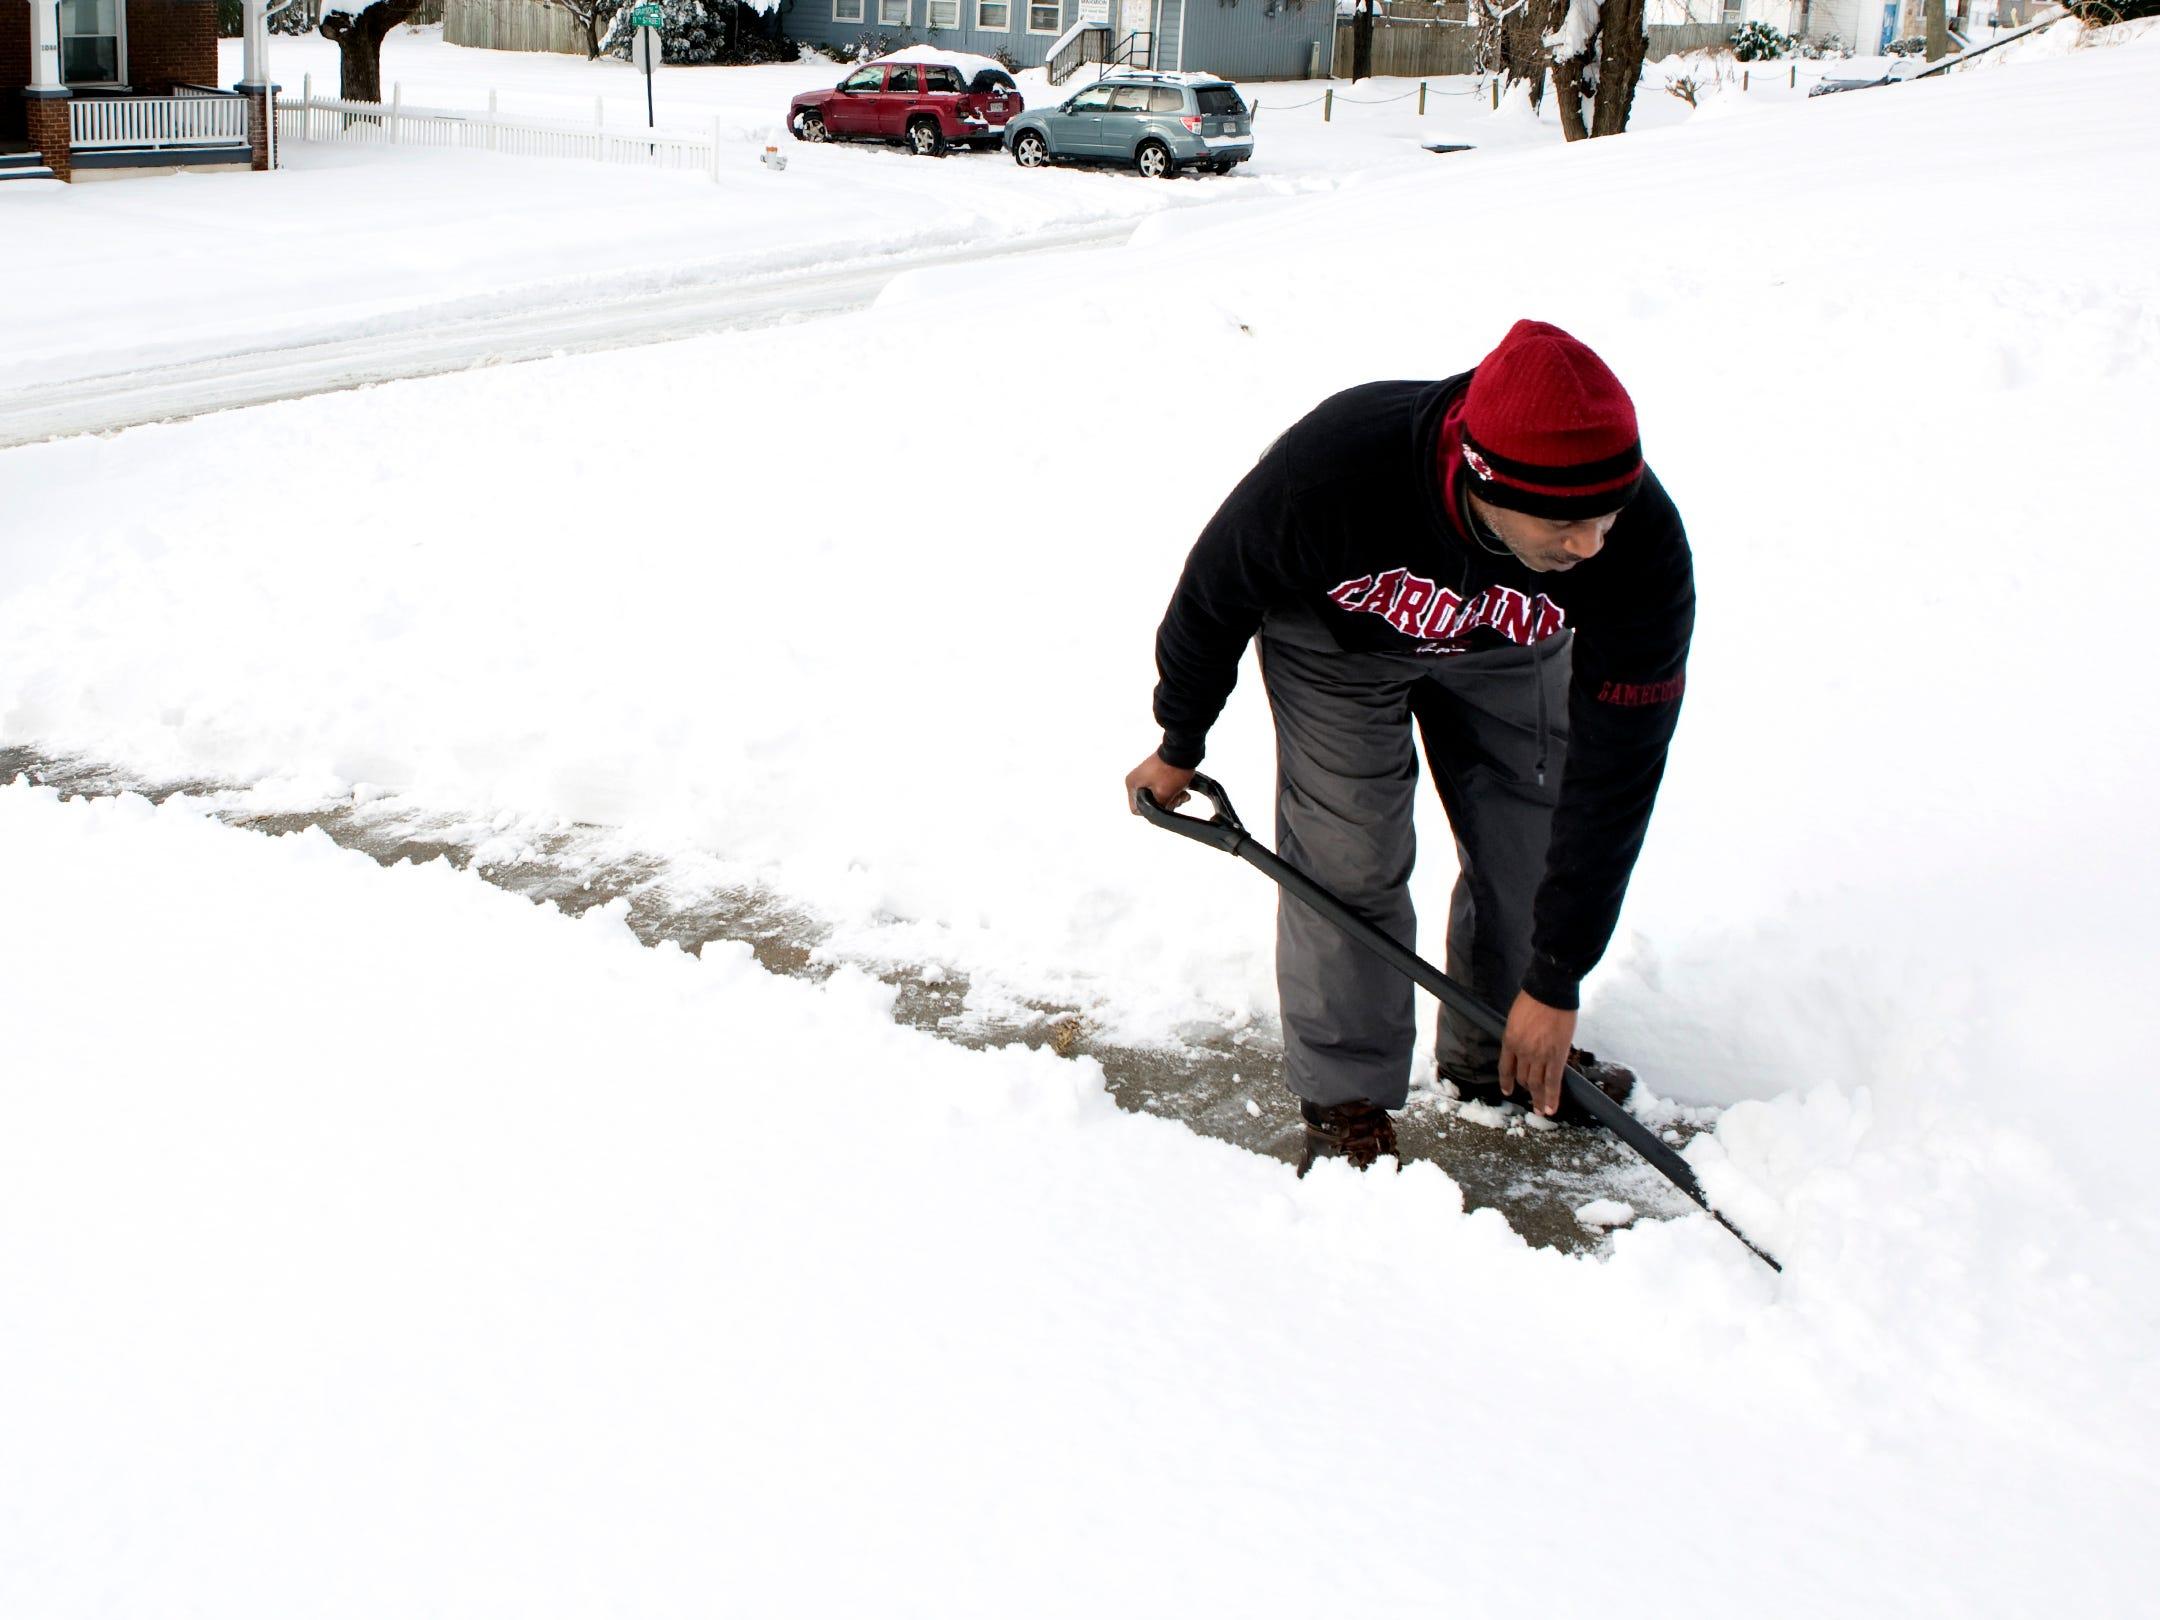 Jamie Price shovels snow for a friend on Dec. 10, 2018, in Roanoke, Va.